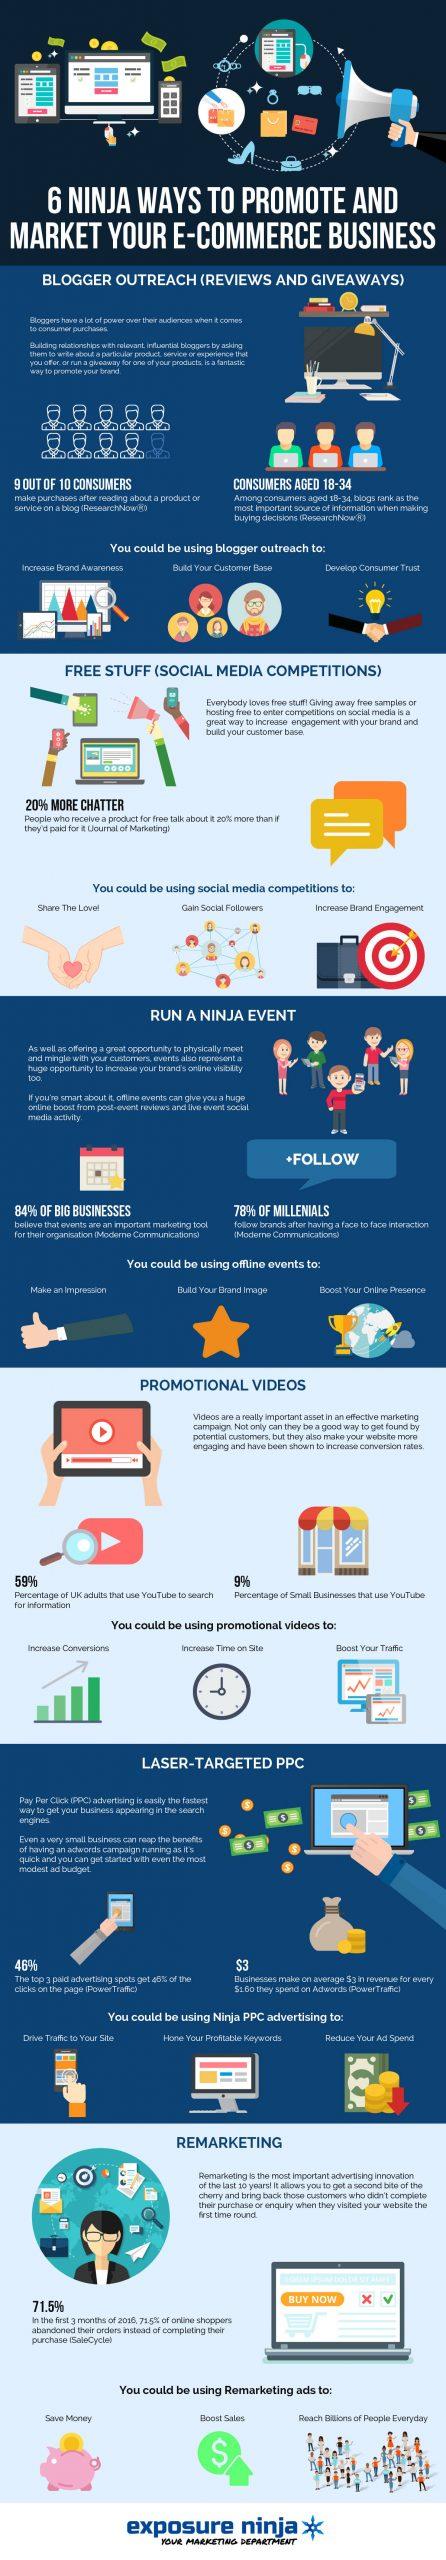 Market your eCommerce Business Inforaphic - Exposure Ninja